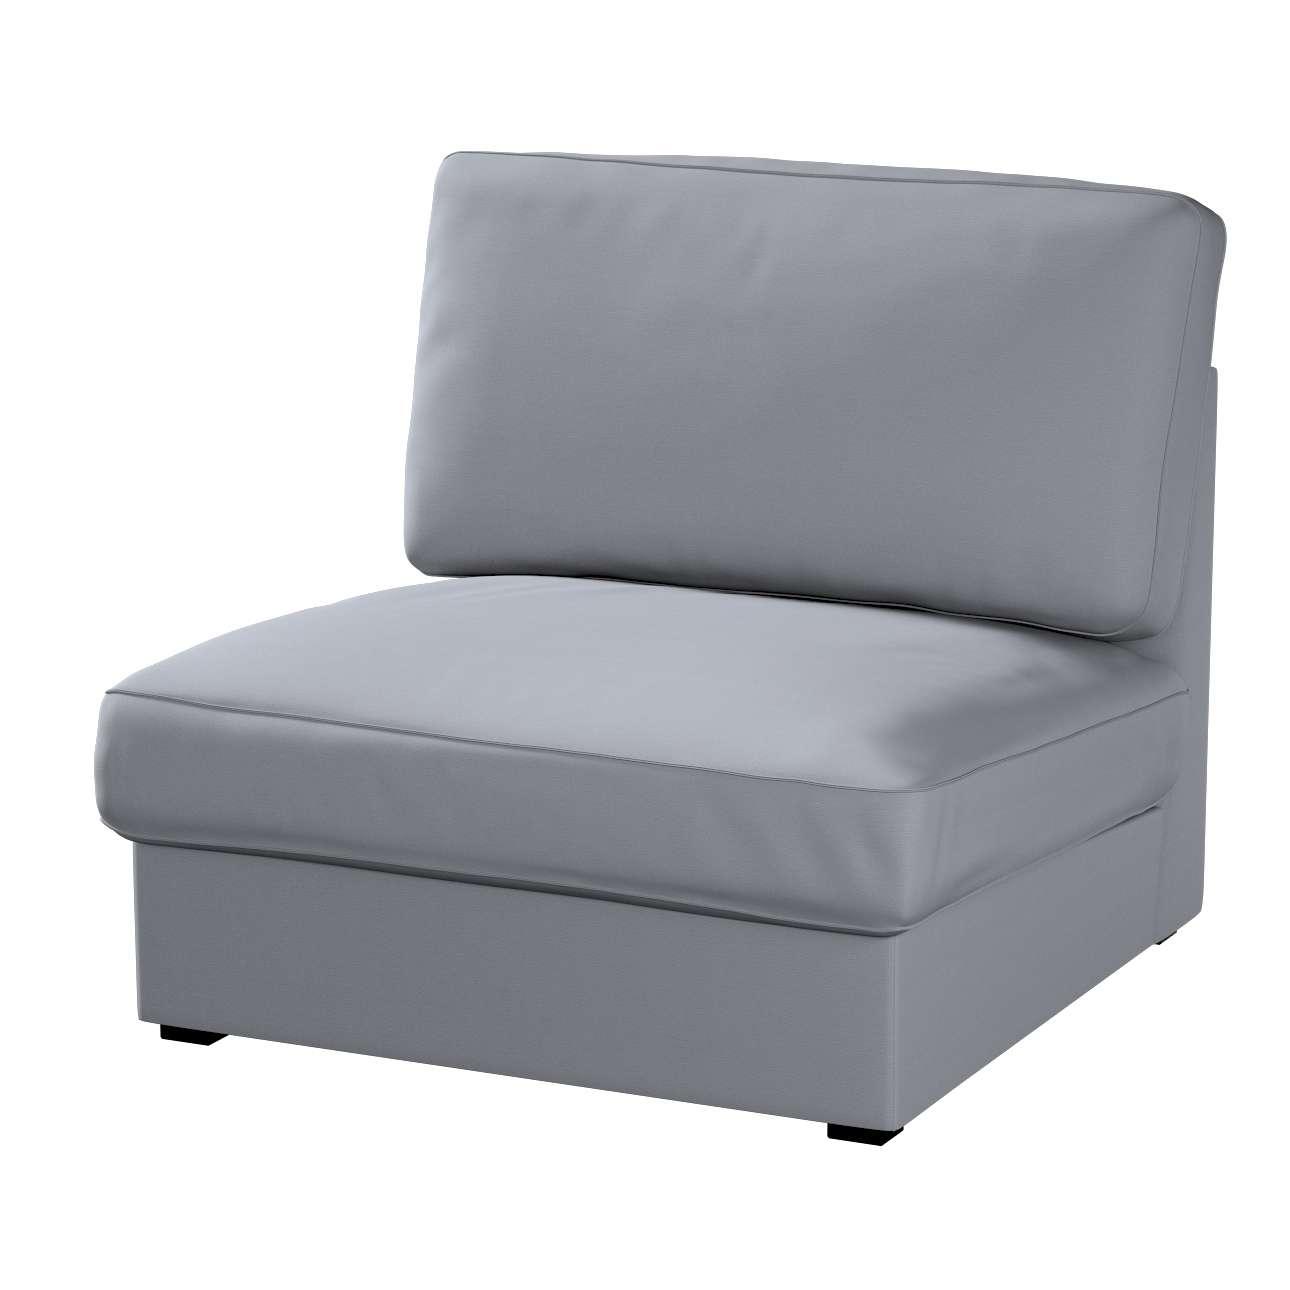 Pokrowiec na fotel Kivik Fotel Kivik w kolekcji Cotton Panama, tkanina: 702-07